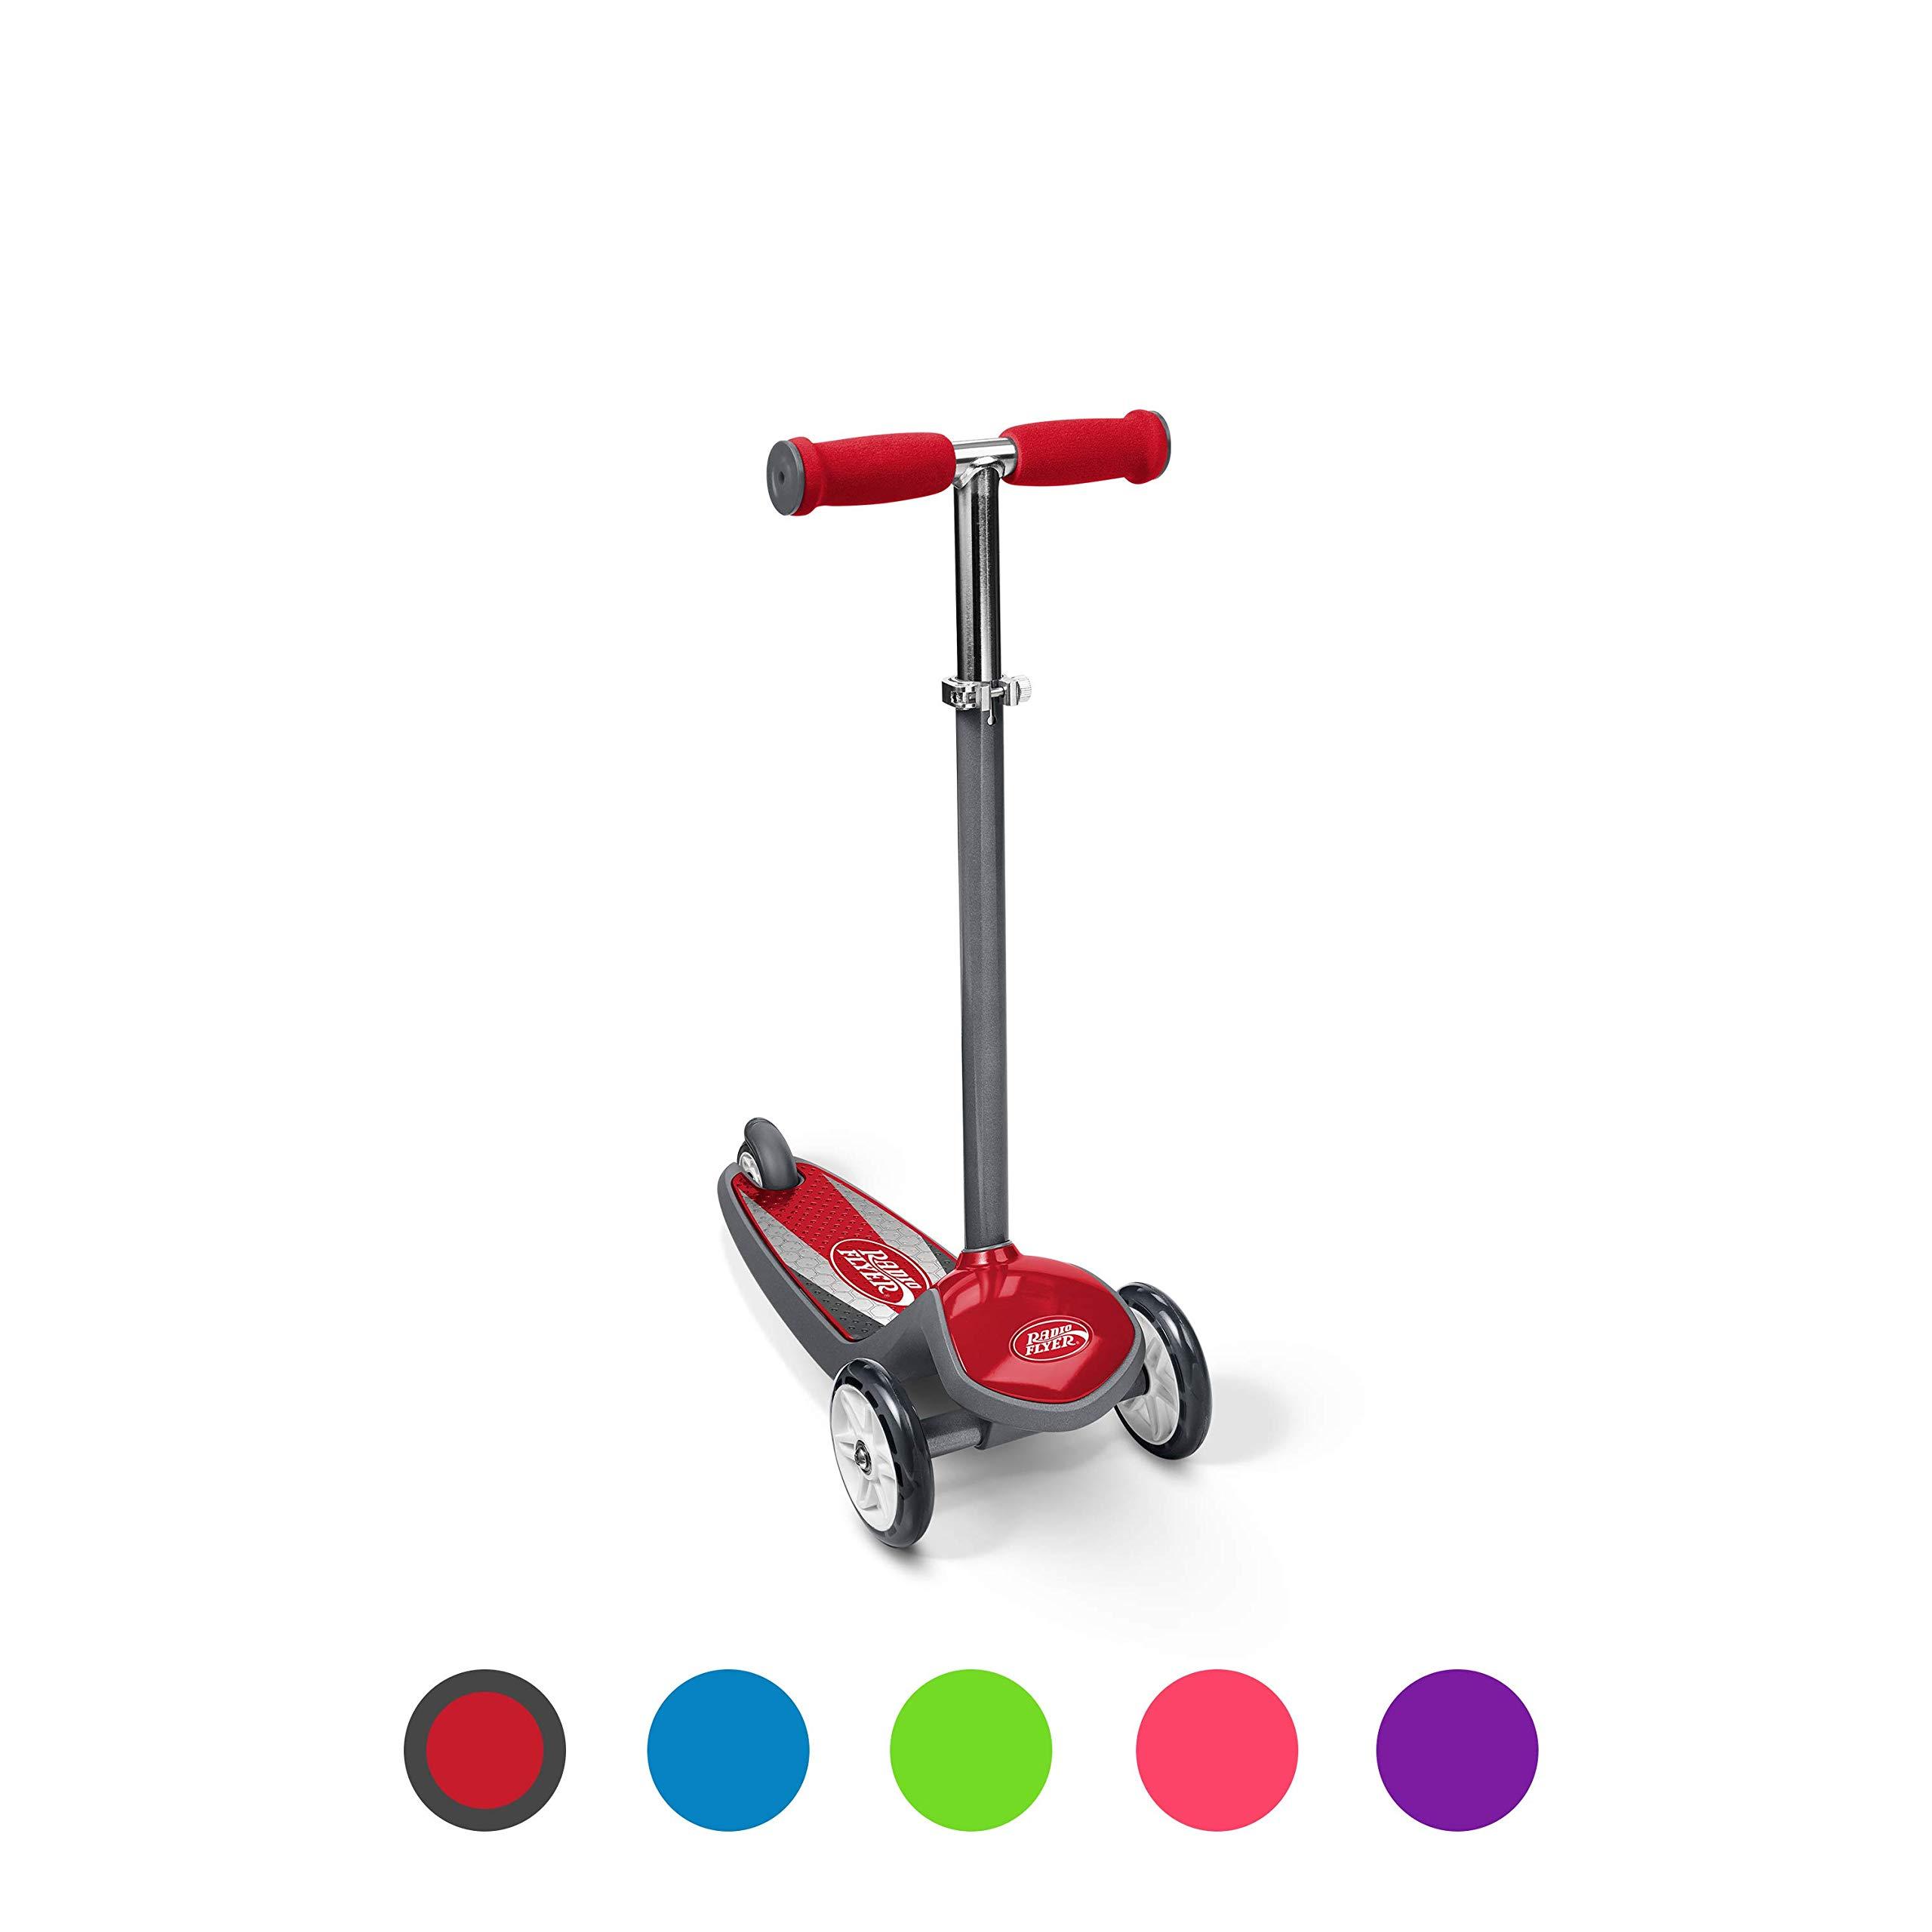 Radio Flyer Color FX EZ Glider 3 Wheel Scooter, Red